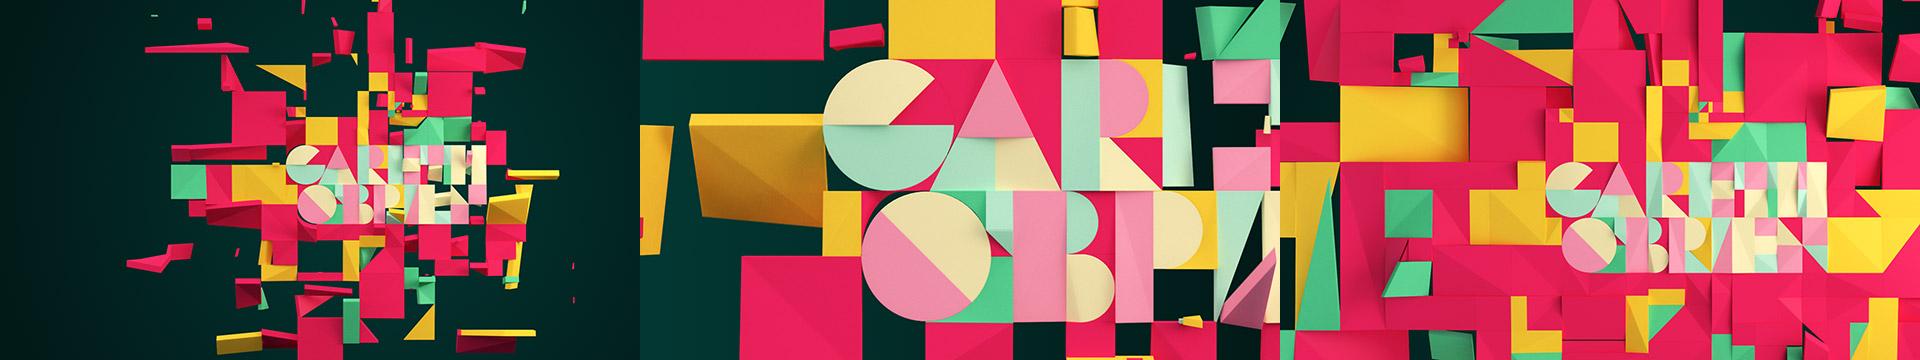 Adobe Make It Gareth OBrien